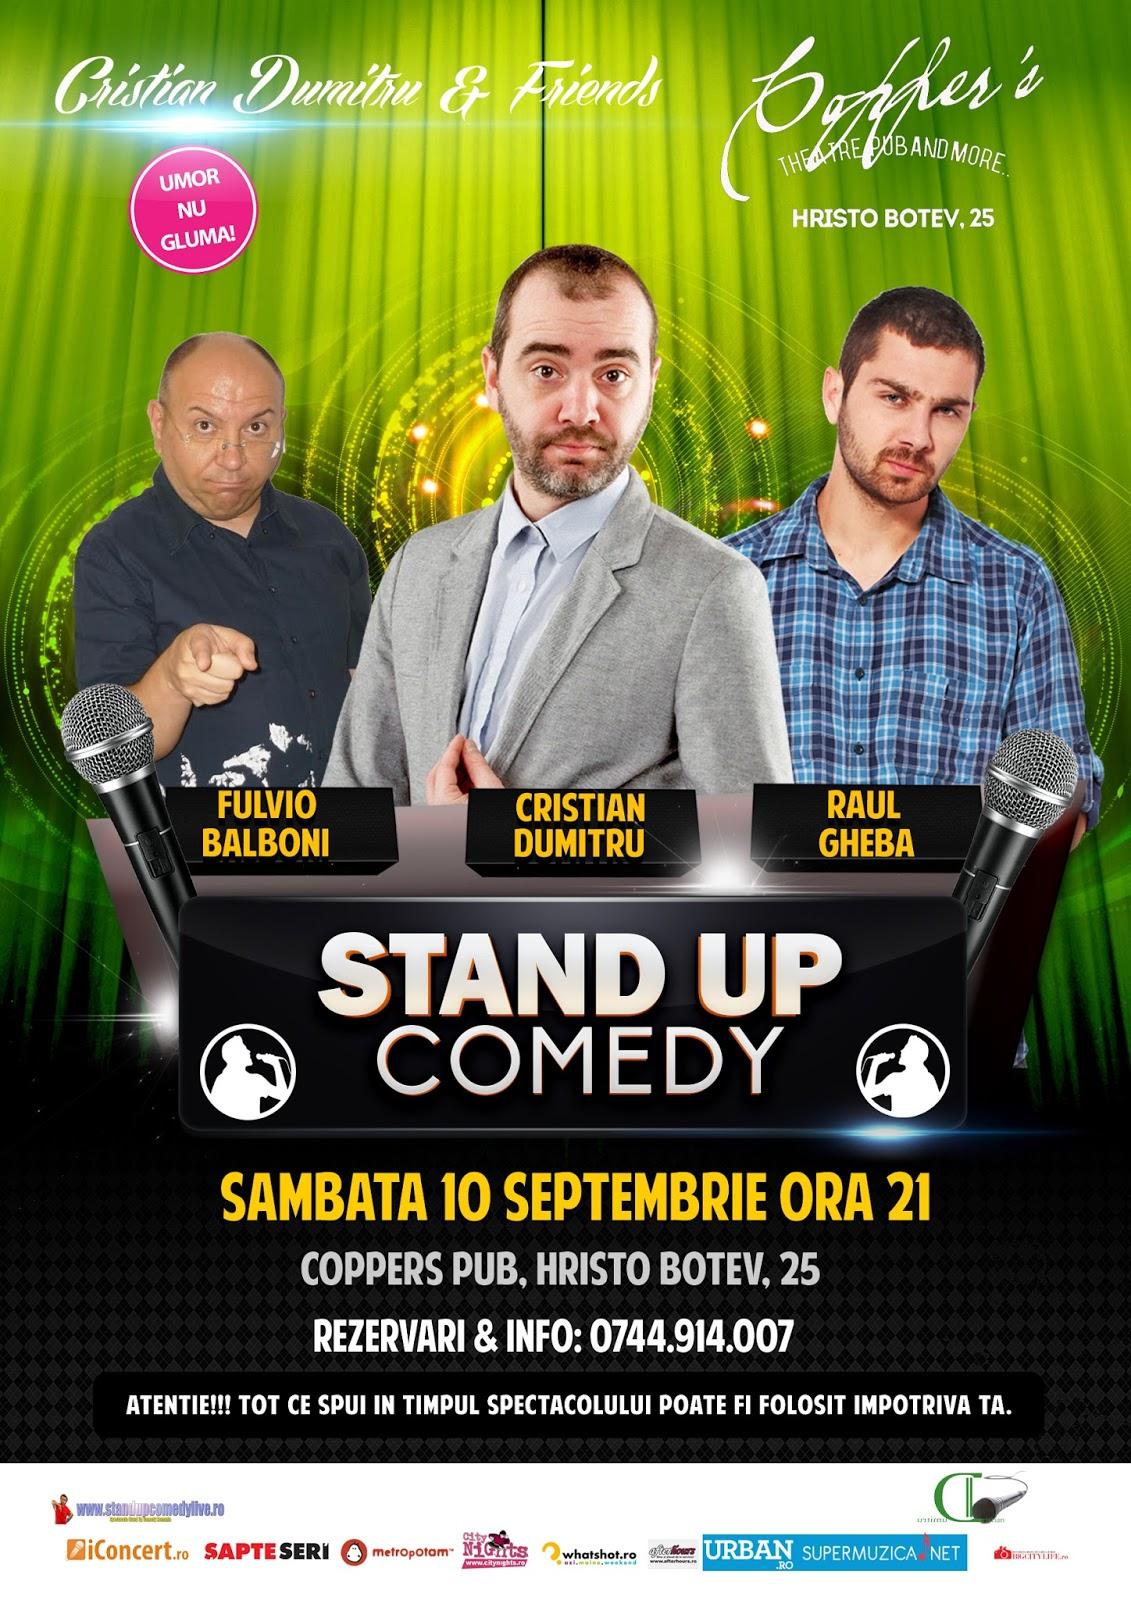 Stand-Up Comedy Sambata 10 septembrie Bucuresti